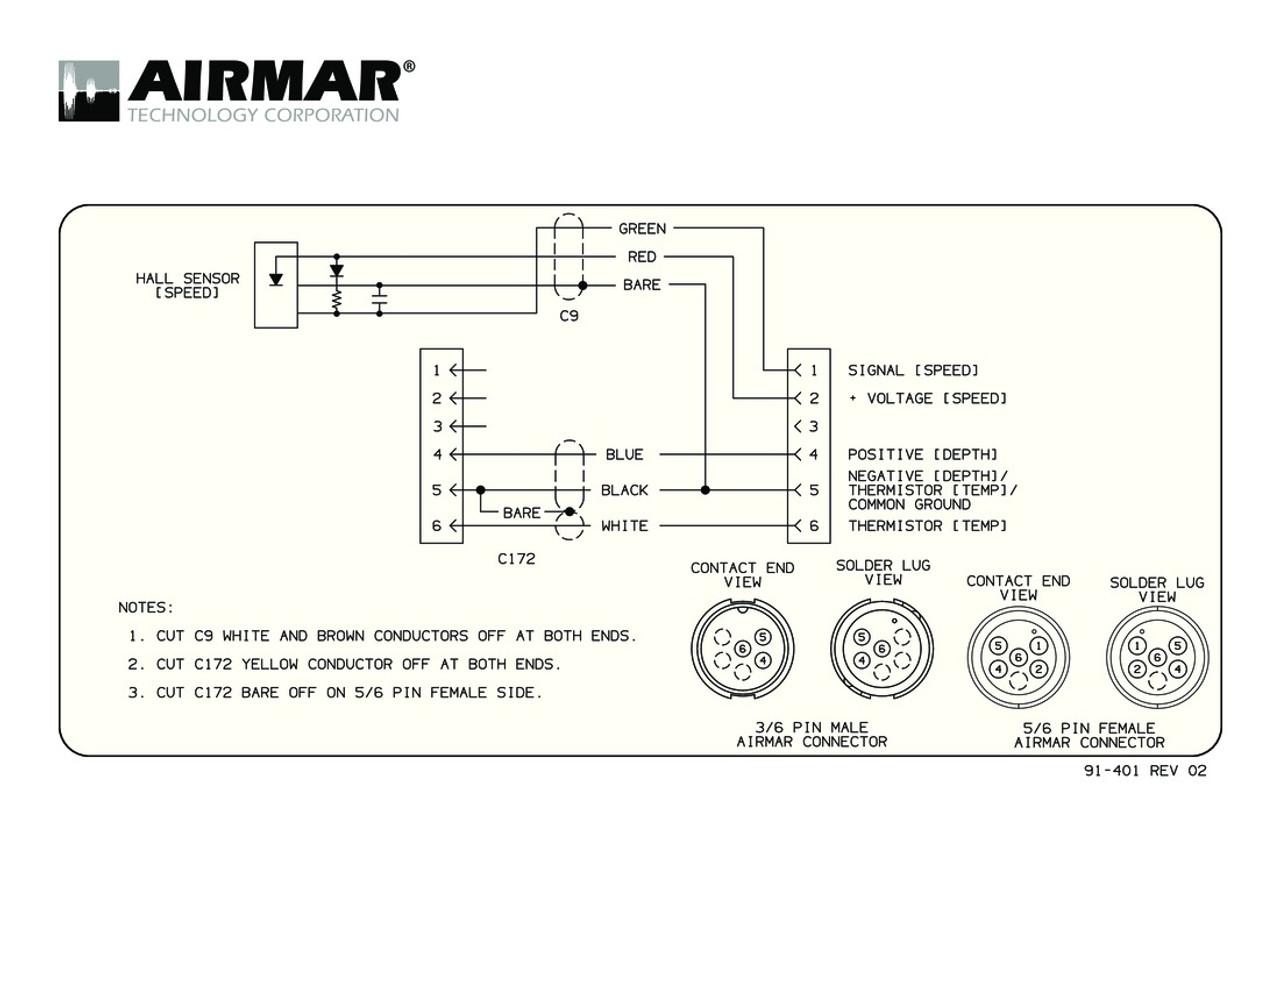 medium resolution of airmar wiring diagram garmin 6 pin s blue bottle marine garmin transducer wiring diagram 4 pin